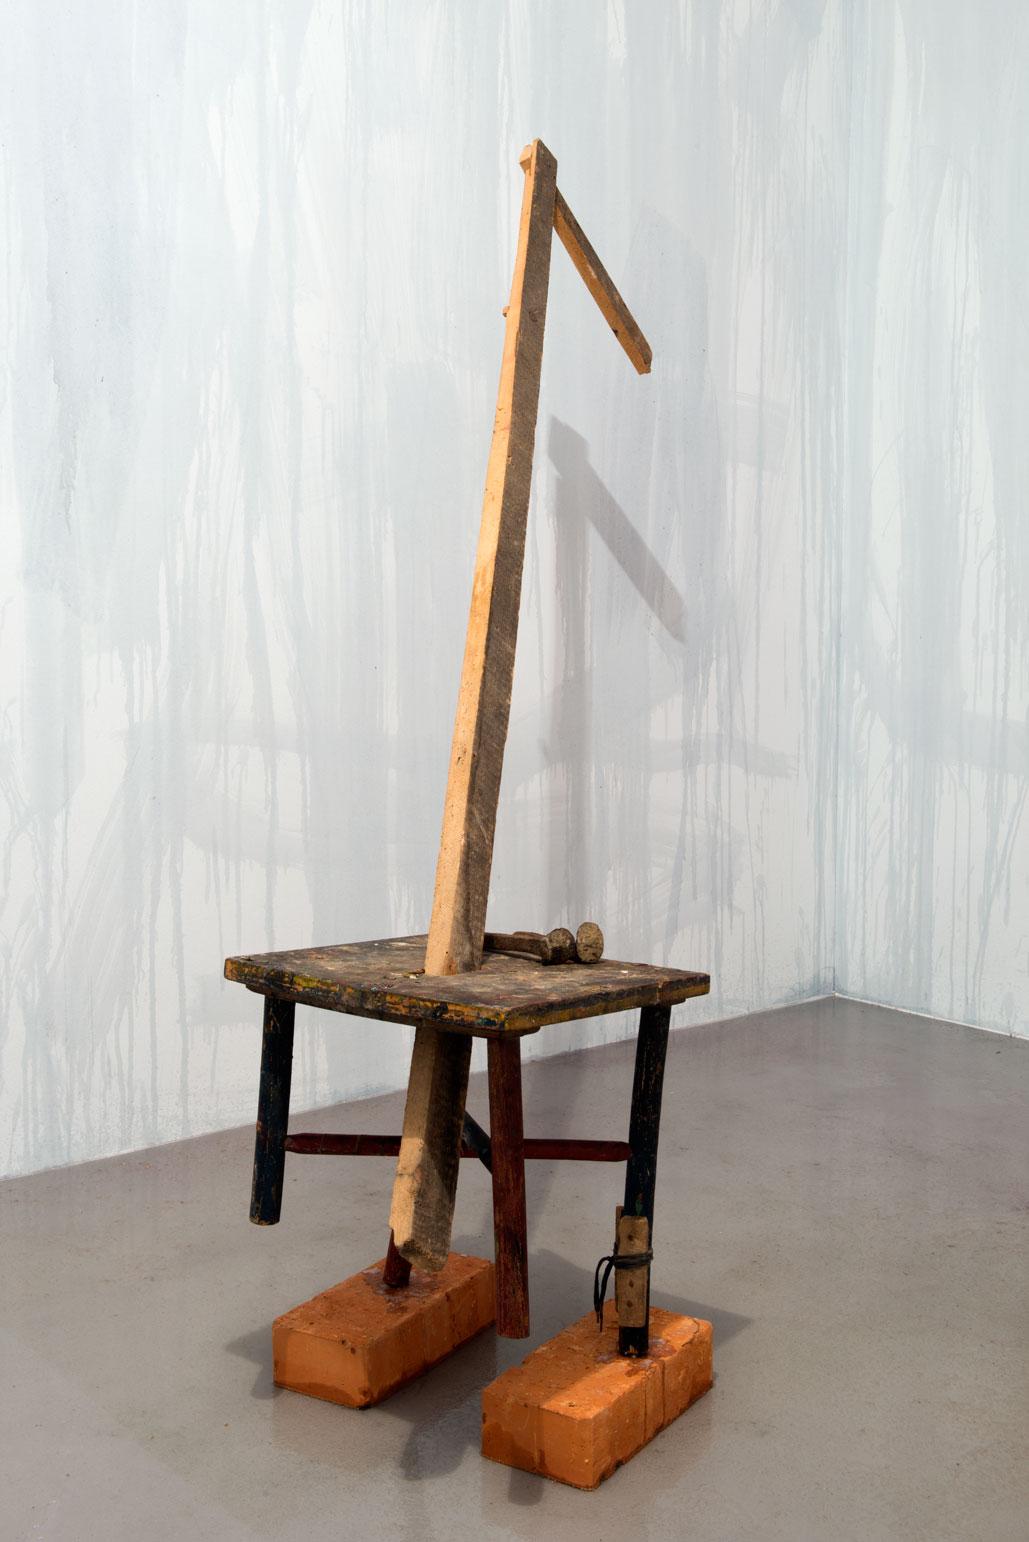 Andrij Sahajdowski, Pokój, instalacja, 2015